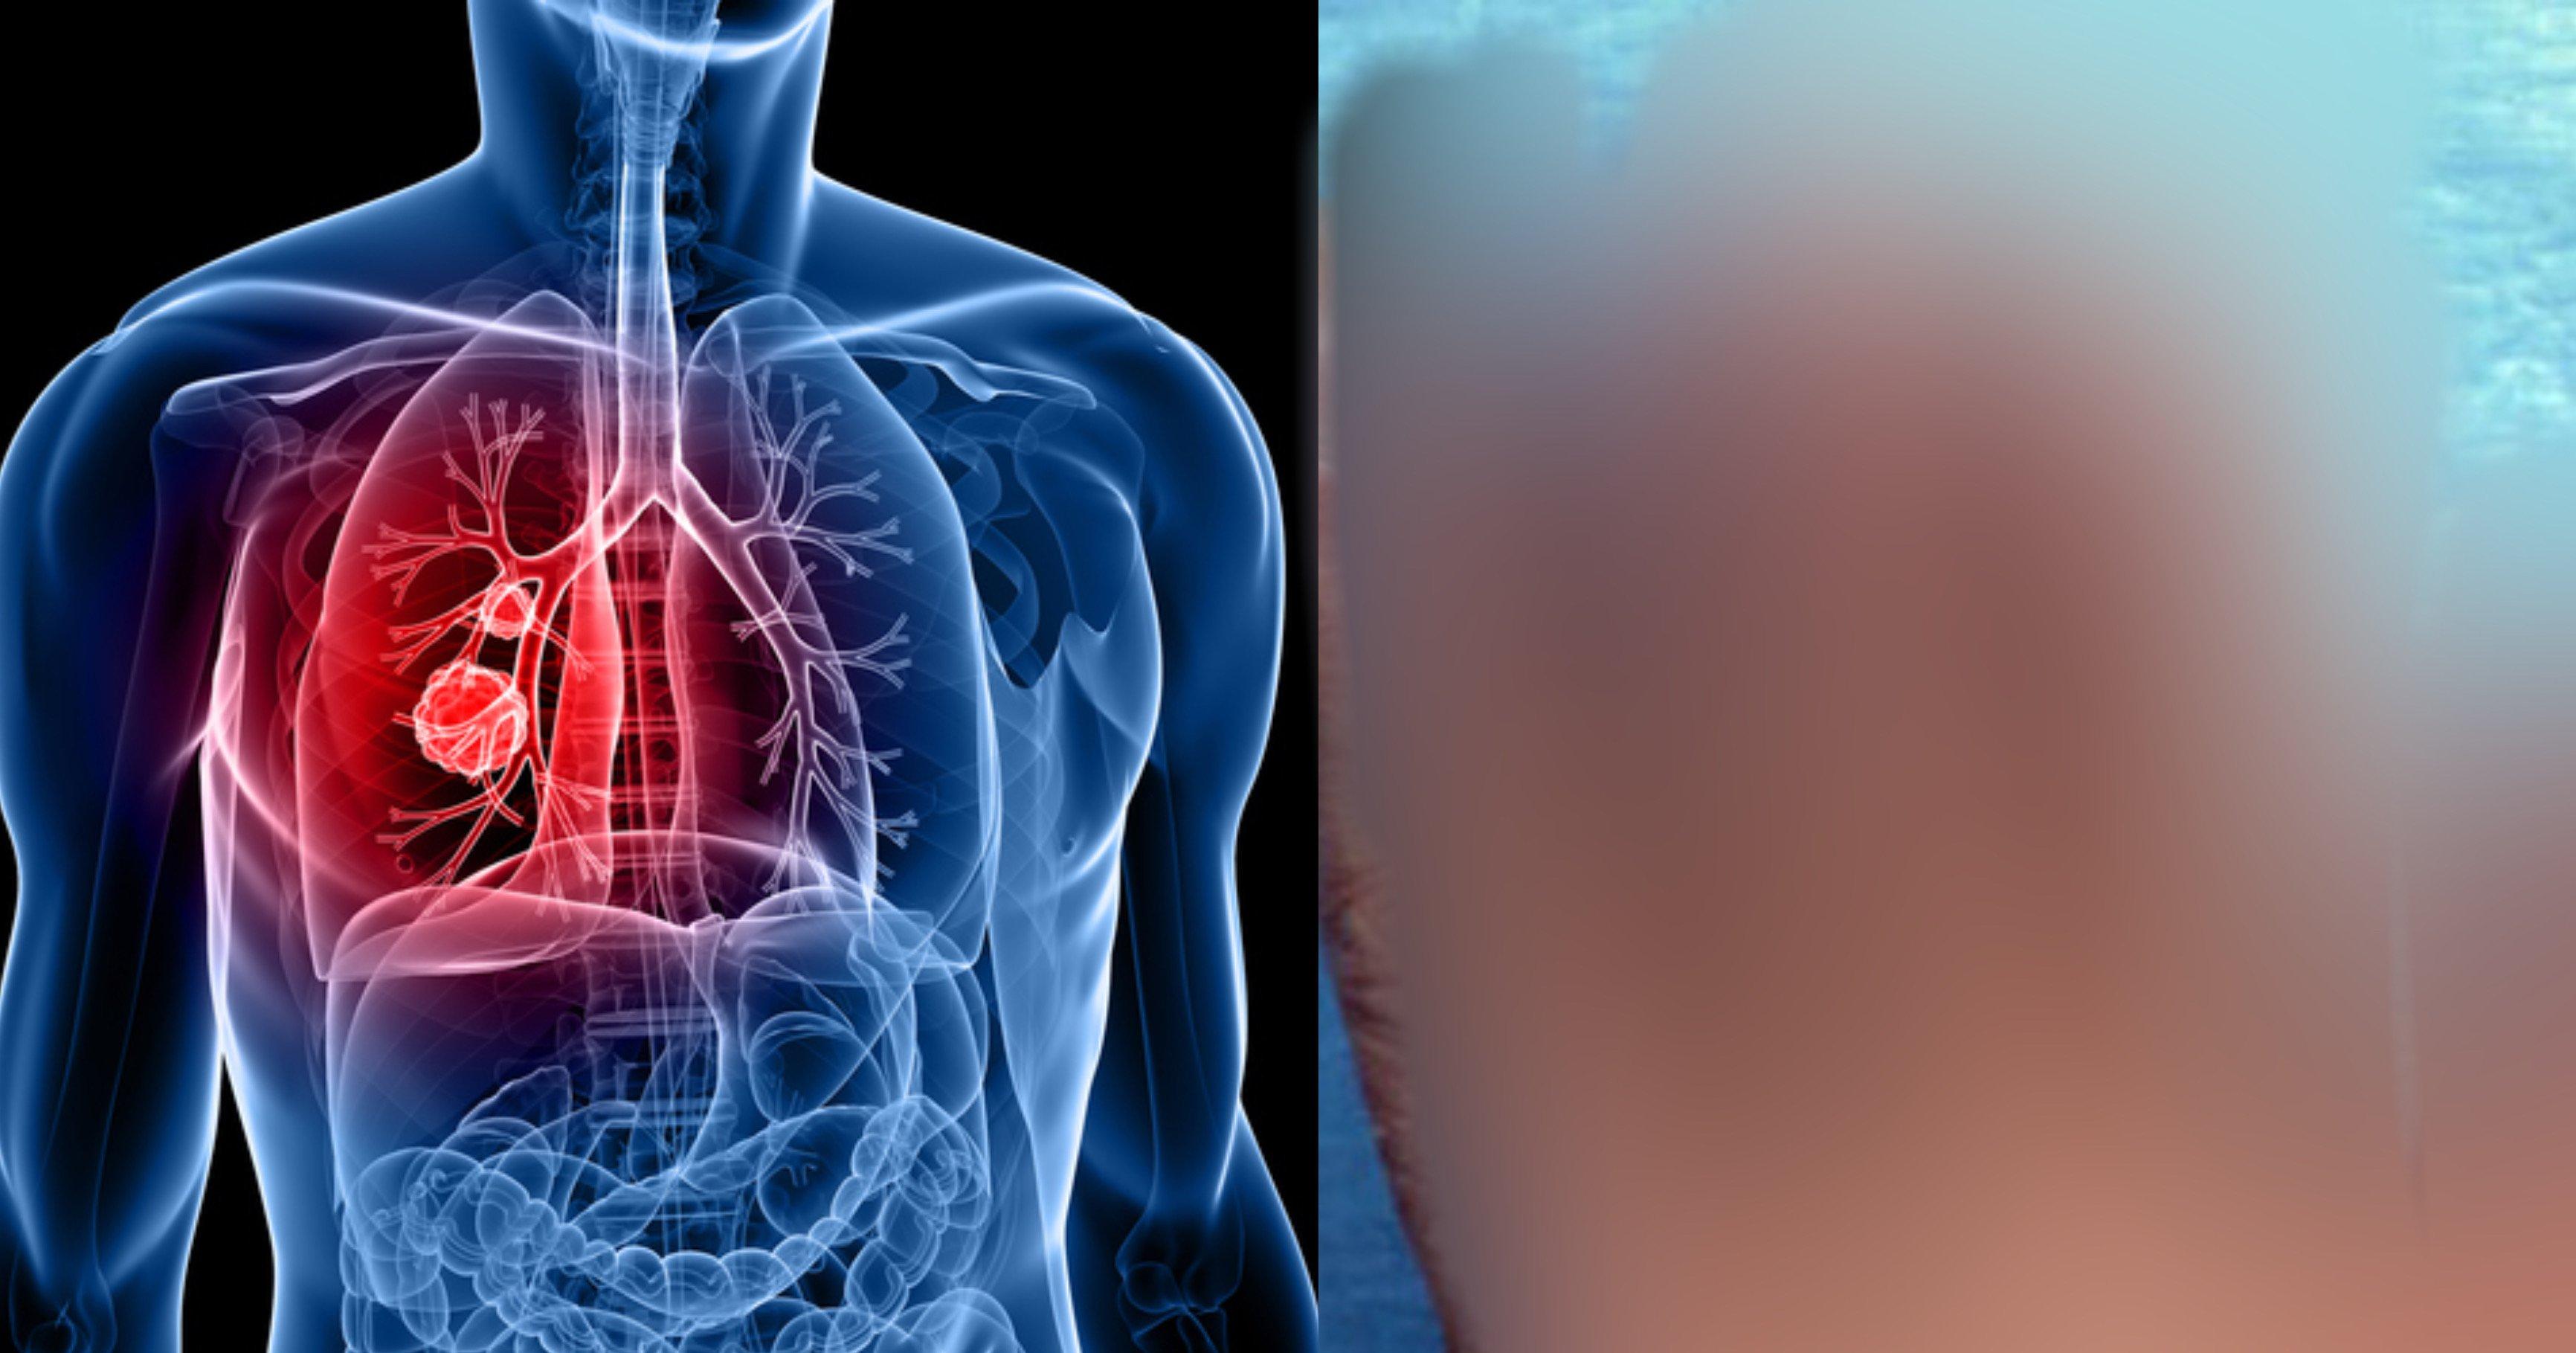 f62d1eb2 6a98 4dab b418 363ad979f6ce.jpeg?resize=1200,630 - 肺がん自己診断ができる?!コレに該当したあなたは肺がんの初期症状かもしれない…